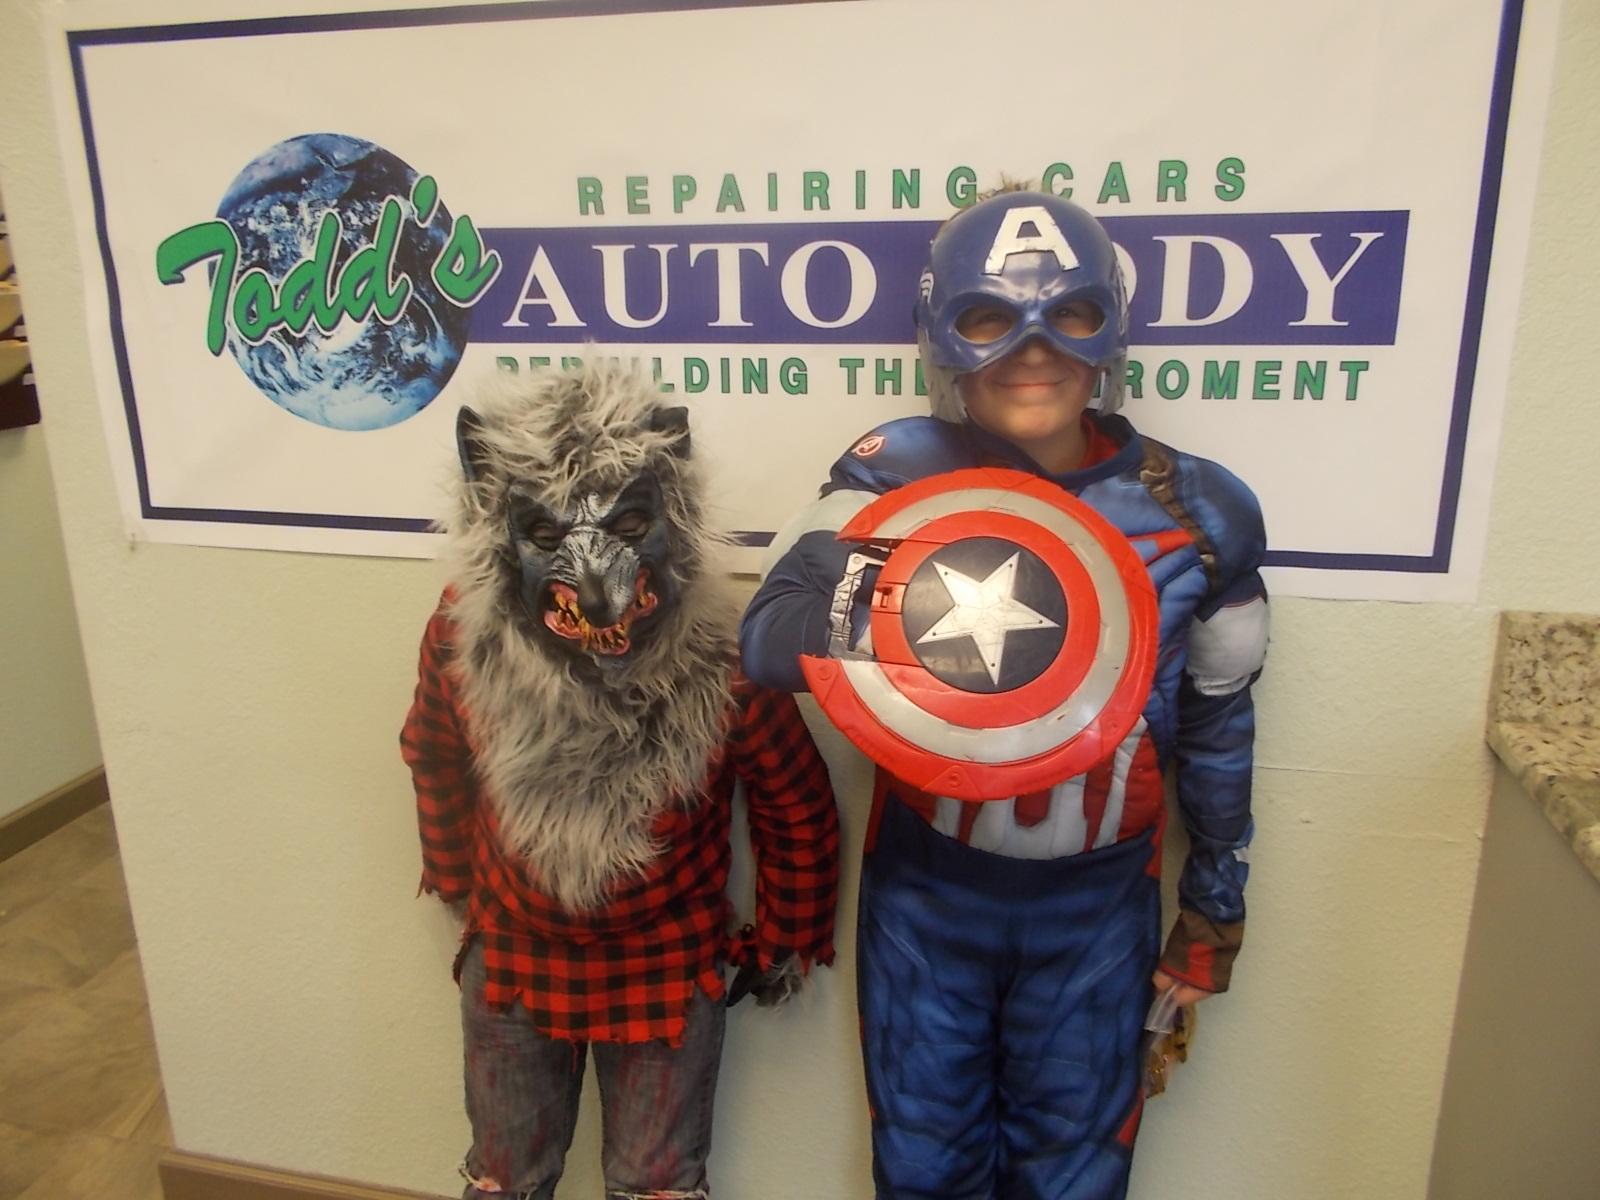 Halloween Pics from Todd's Auto Body